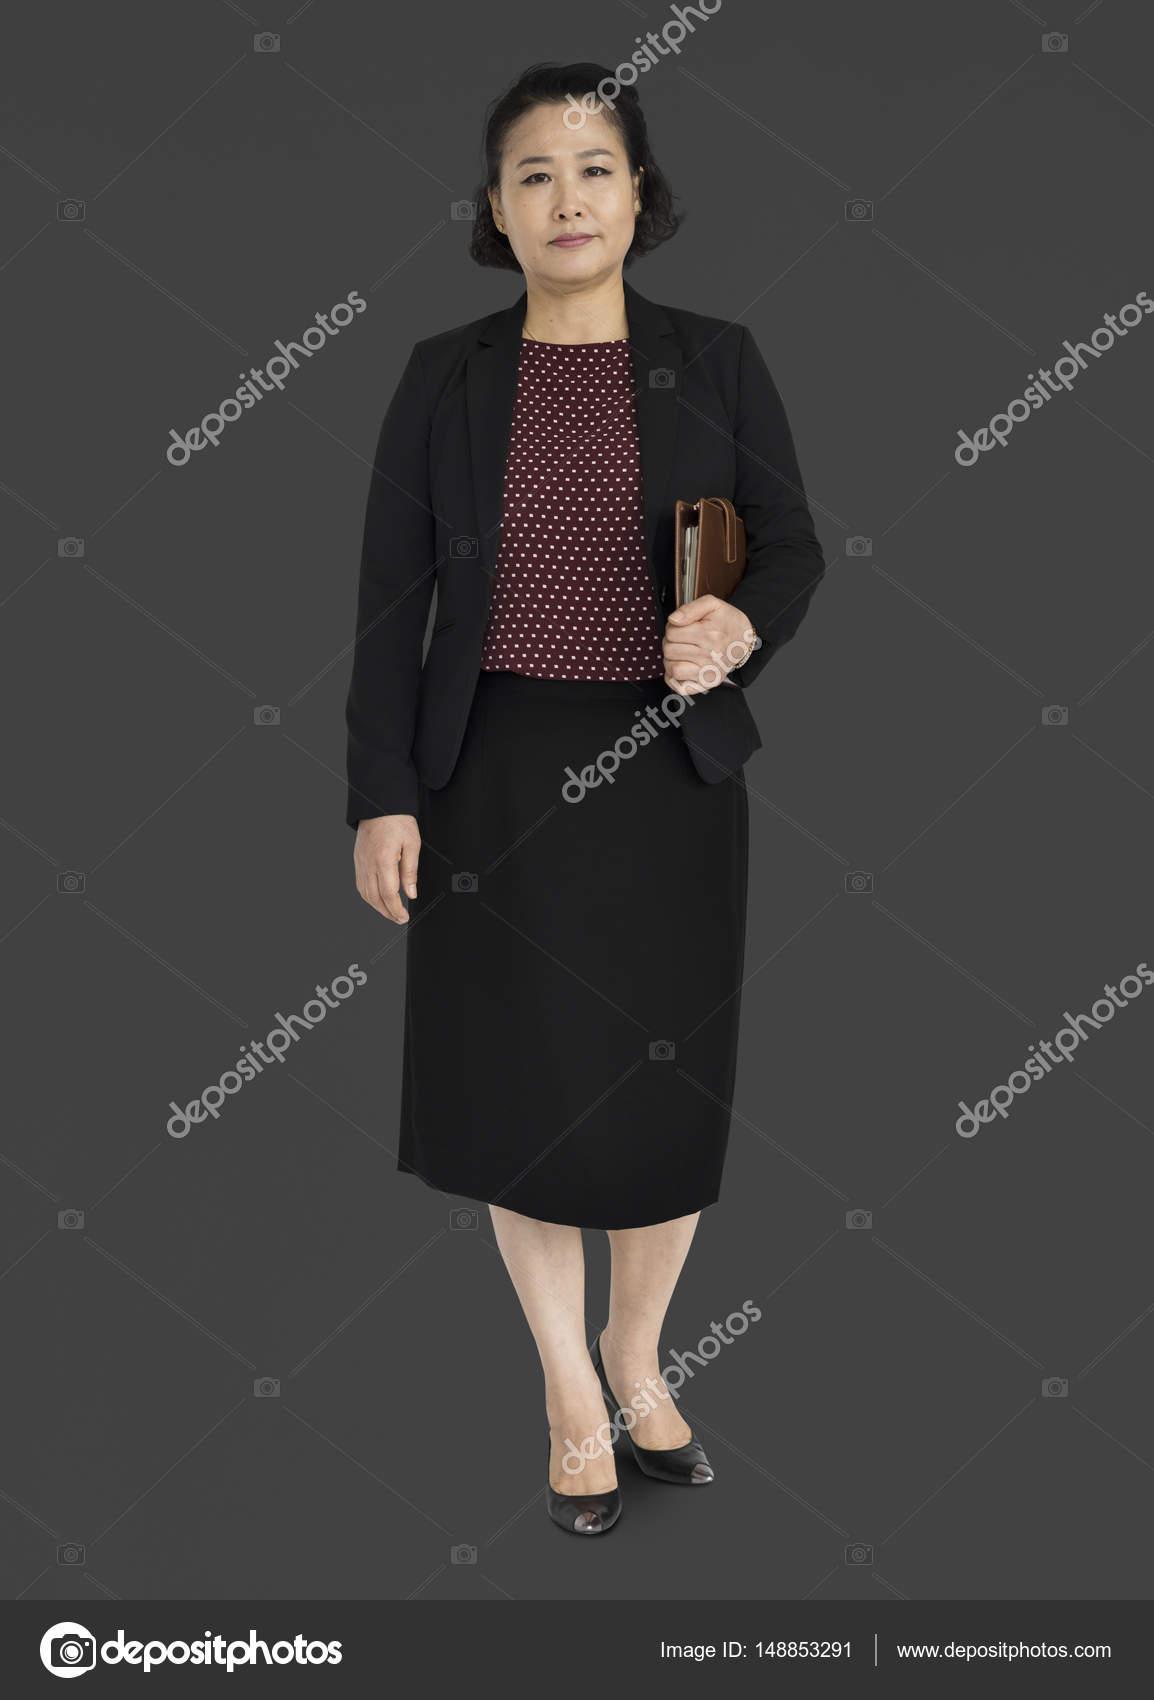 Mature Asian Businesswoman Stock Photo